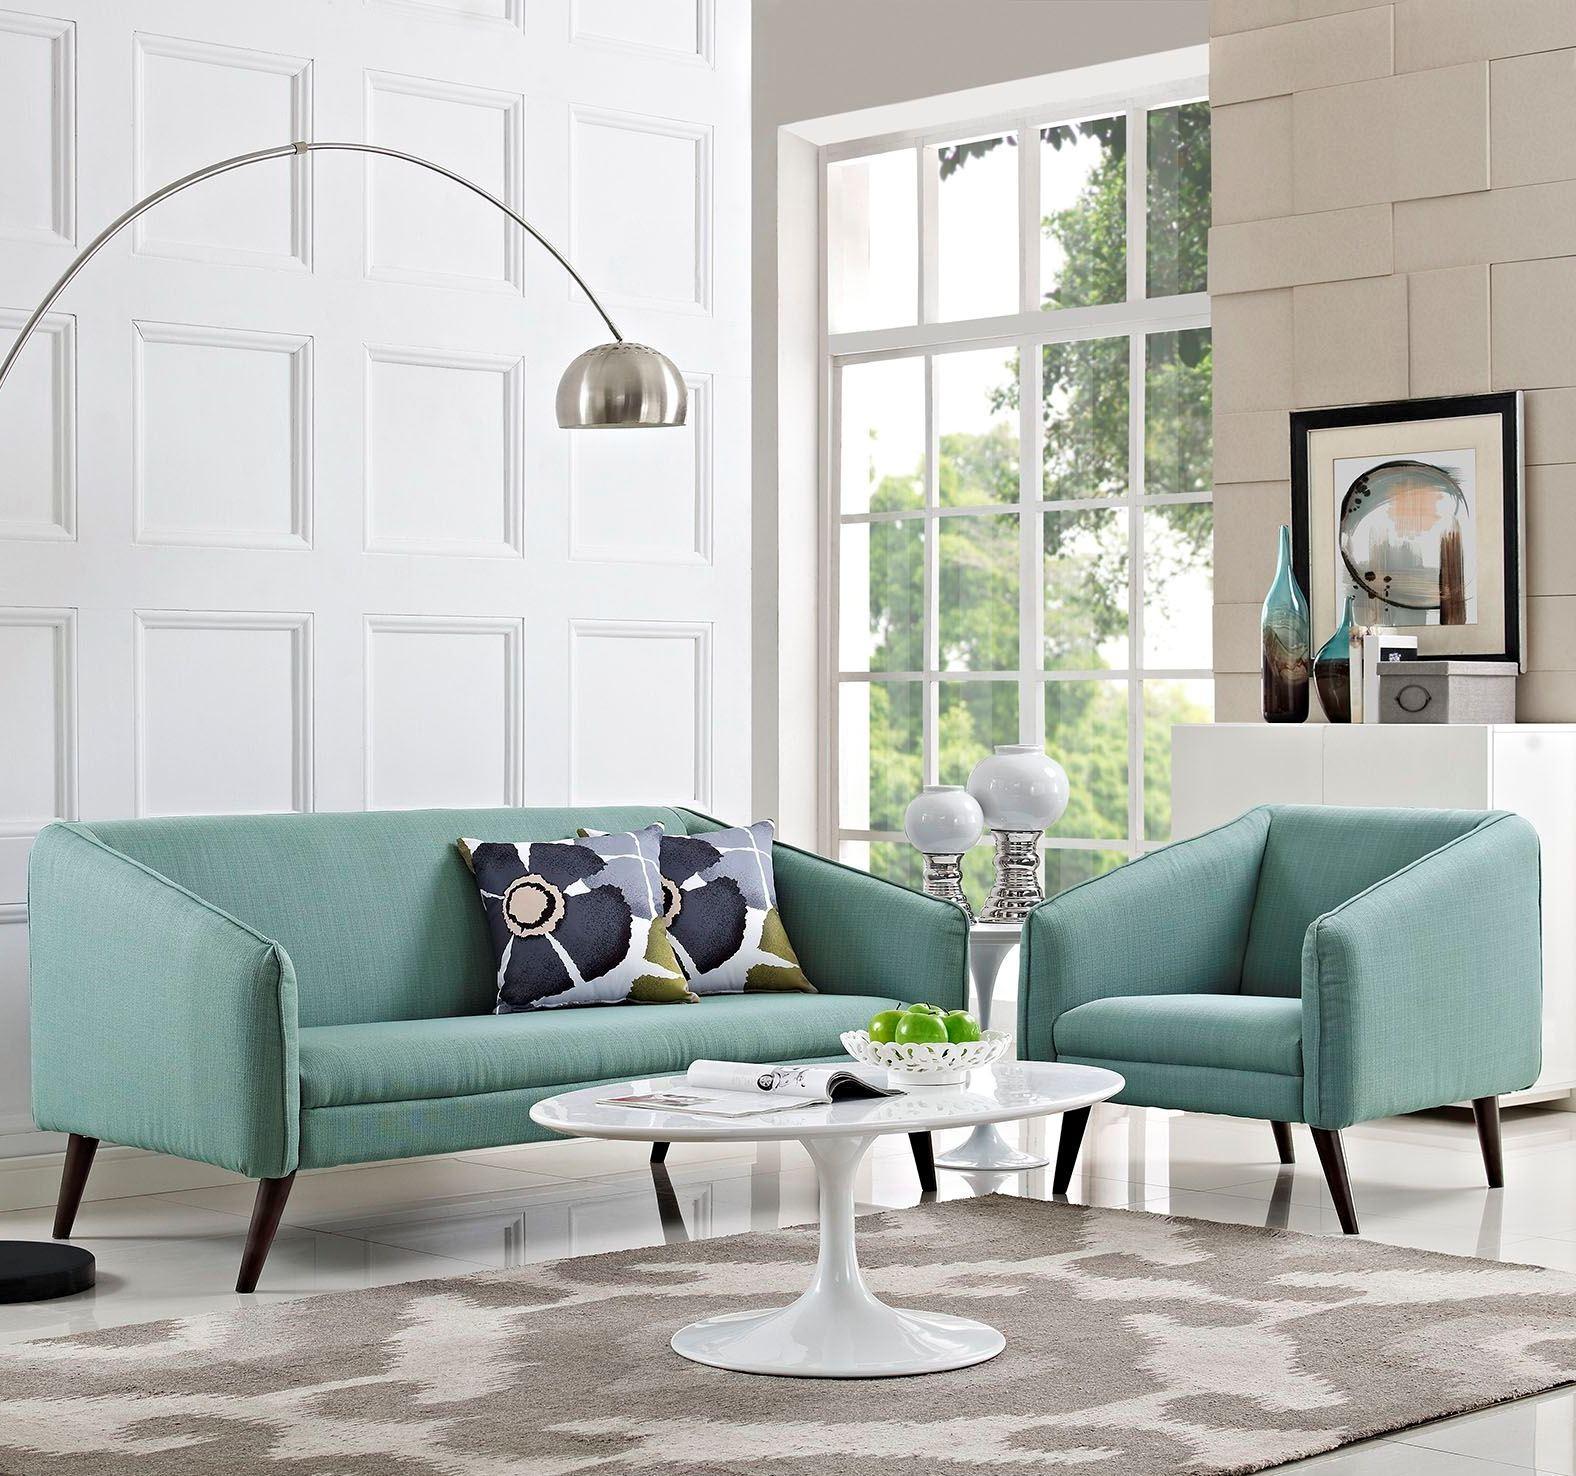 Slide laguna 2 piece living room set from renegade for 2 piece living room set